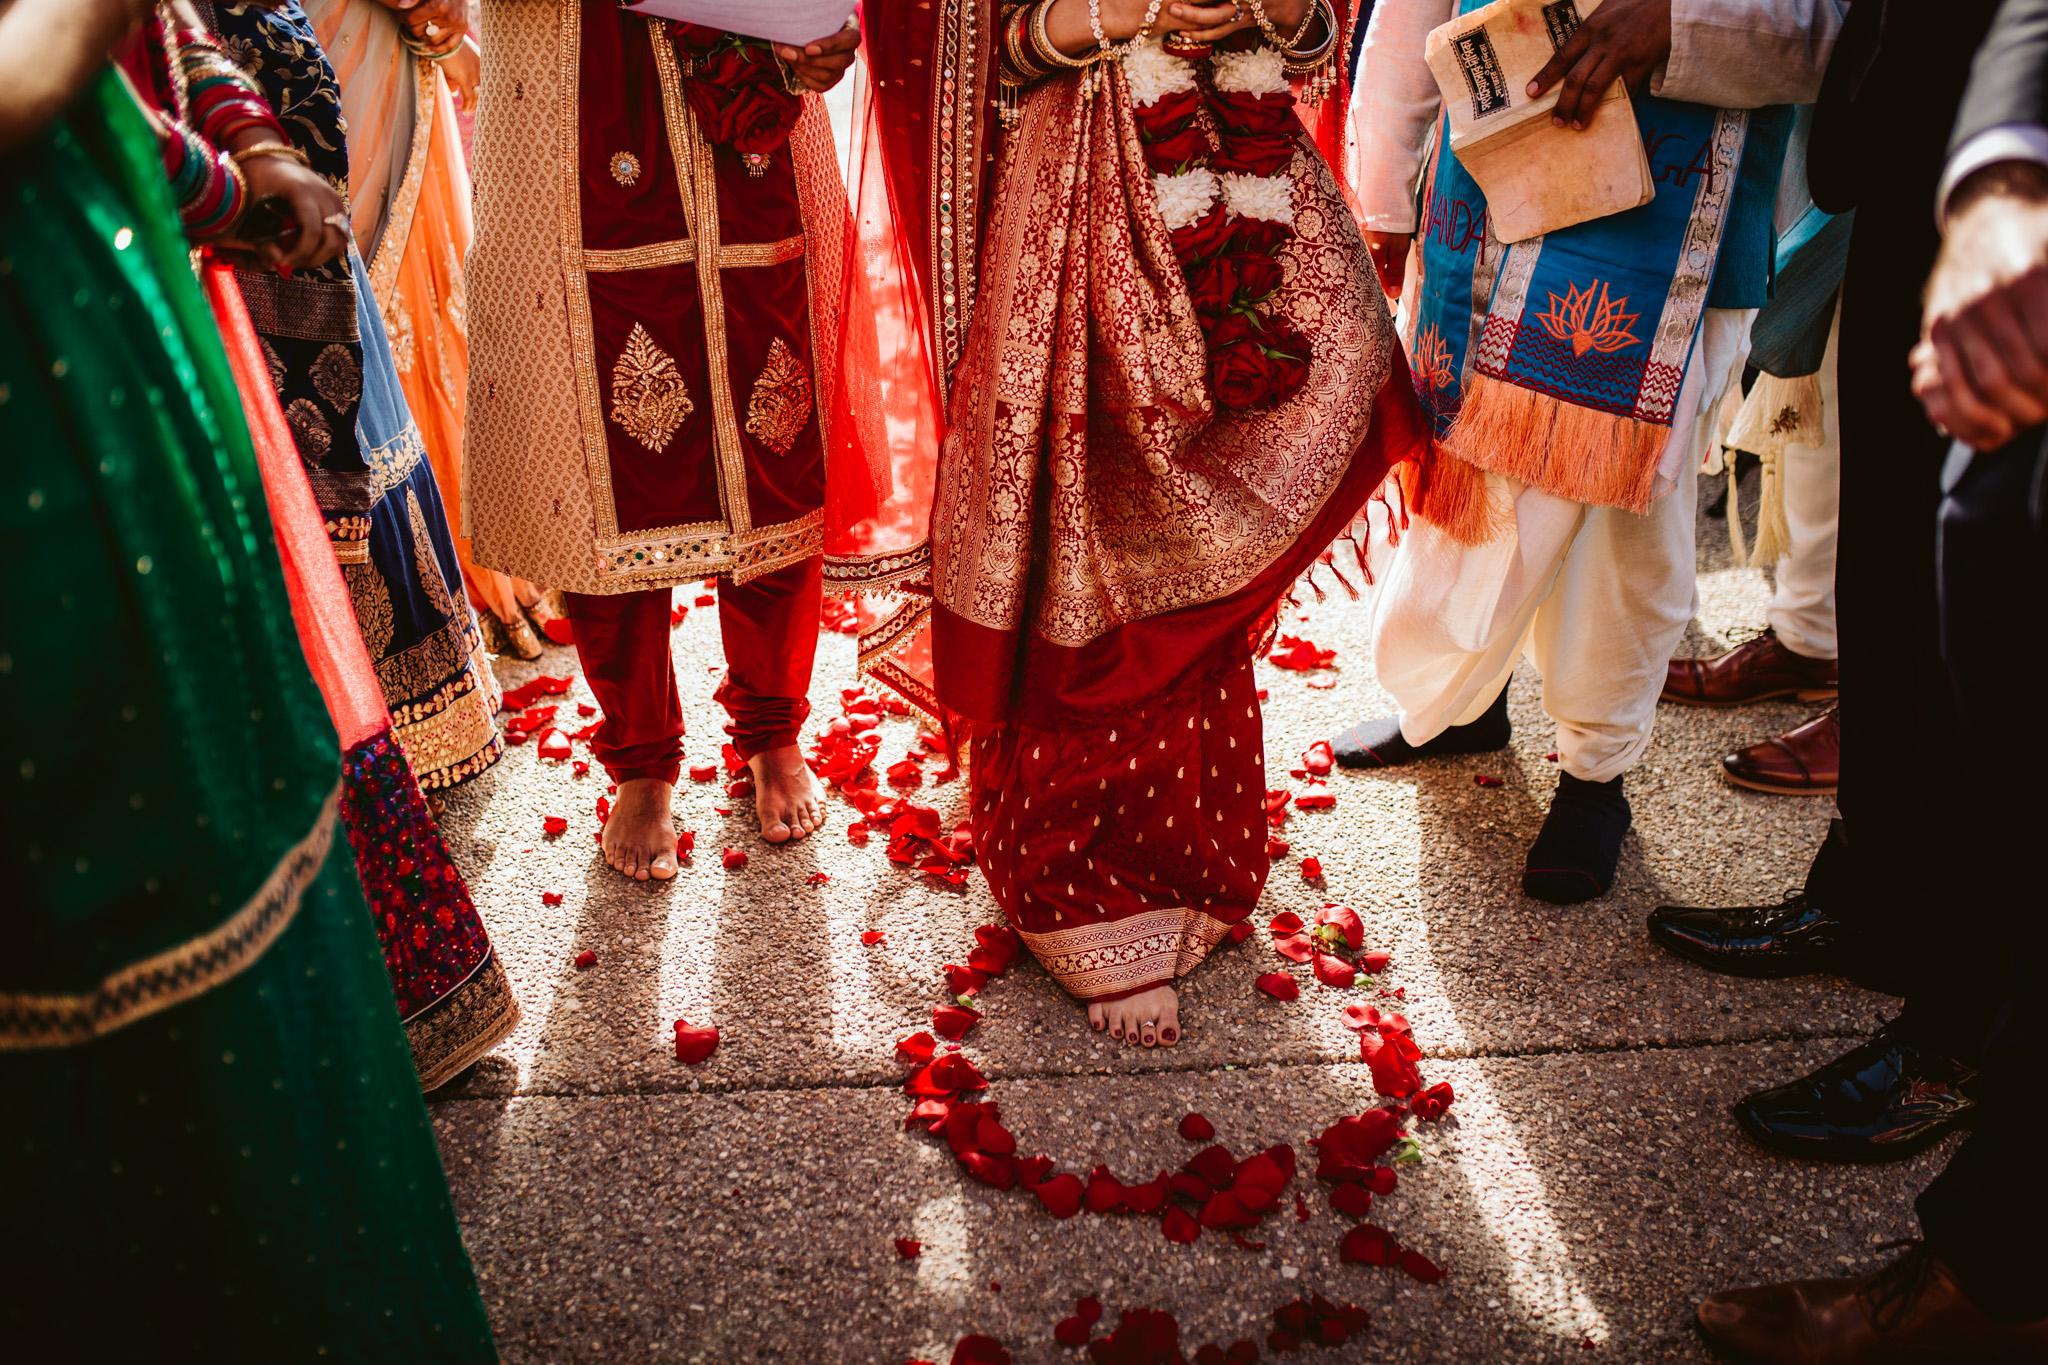 rebeccaburtphotography.hindiwedding.moraisvineyards.virginiawedding-144.JPG